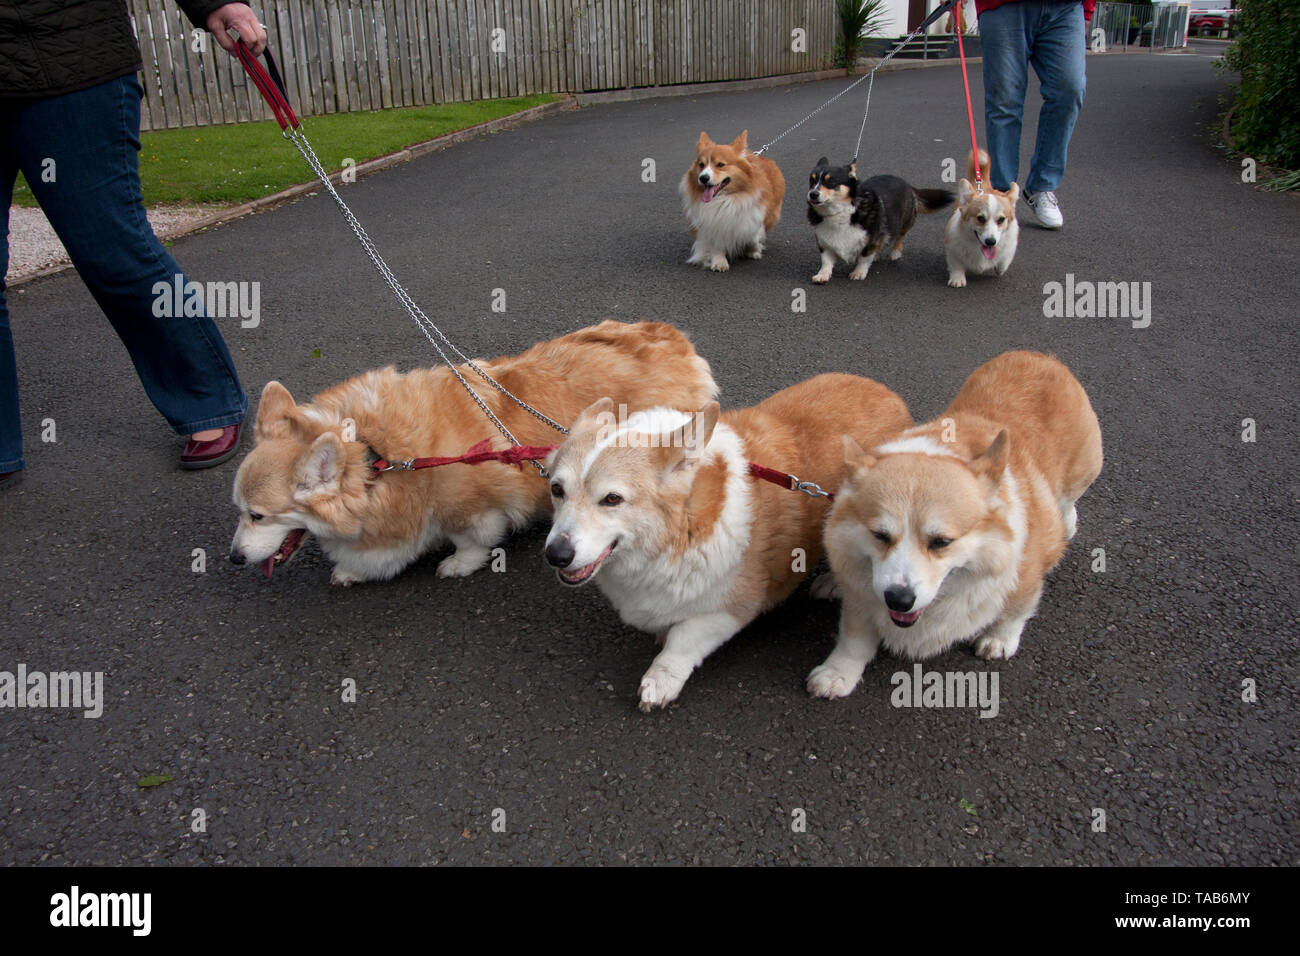 Corgi Dogs, Group of six adults being walked on leads, England, UK - Stock Image